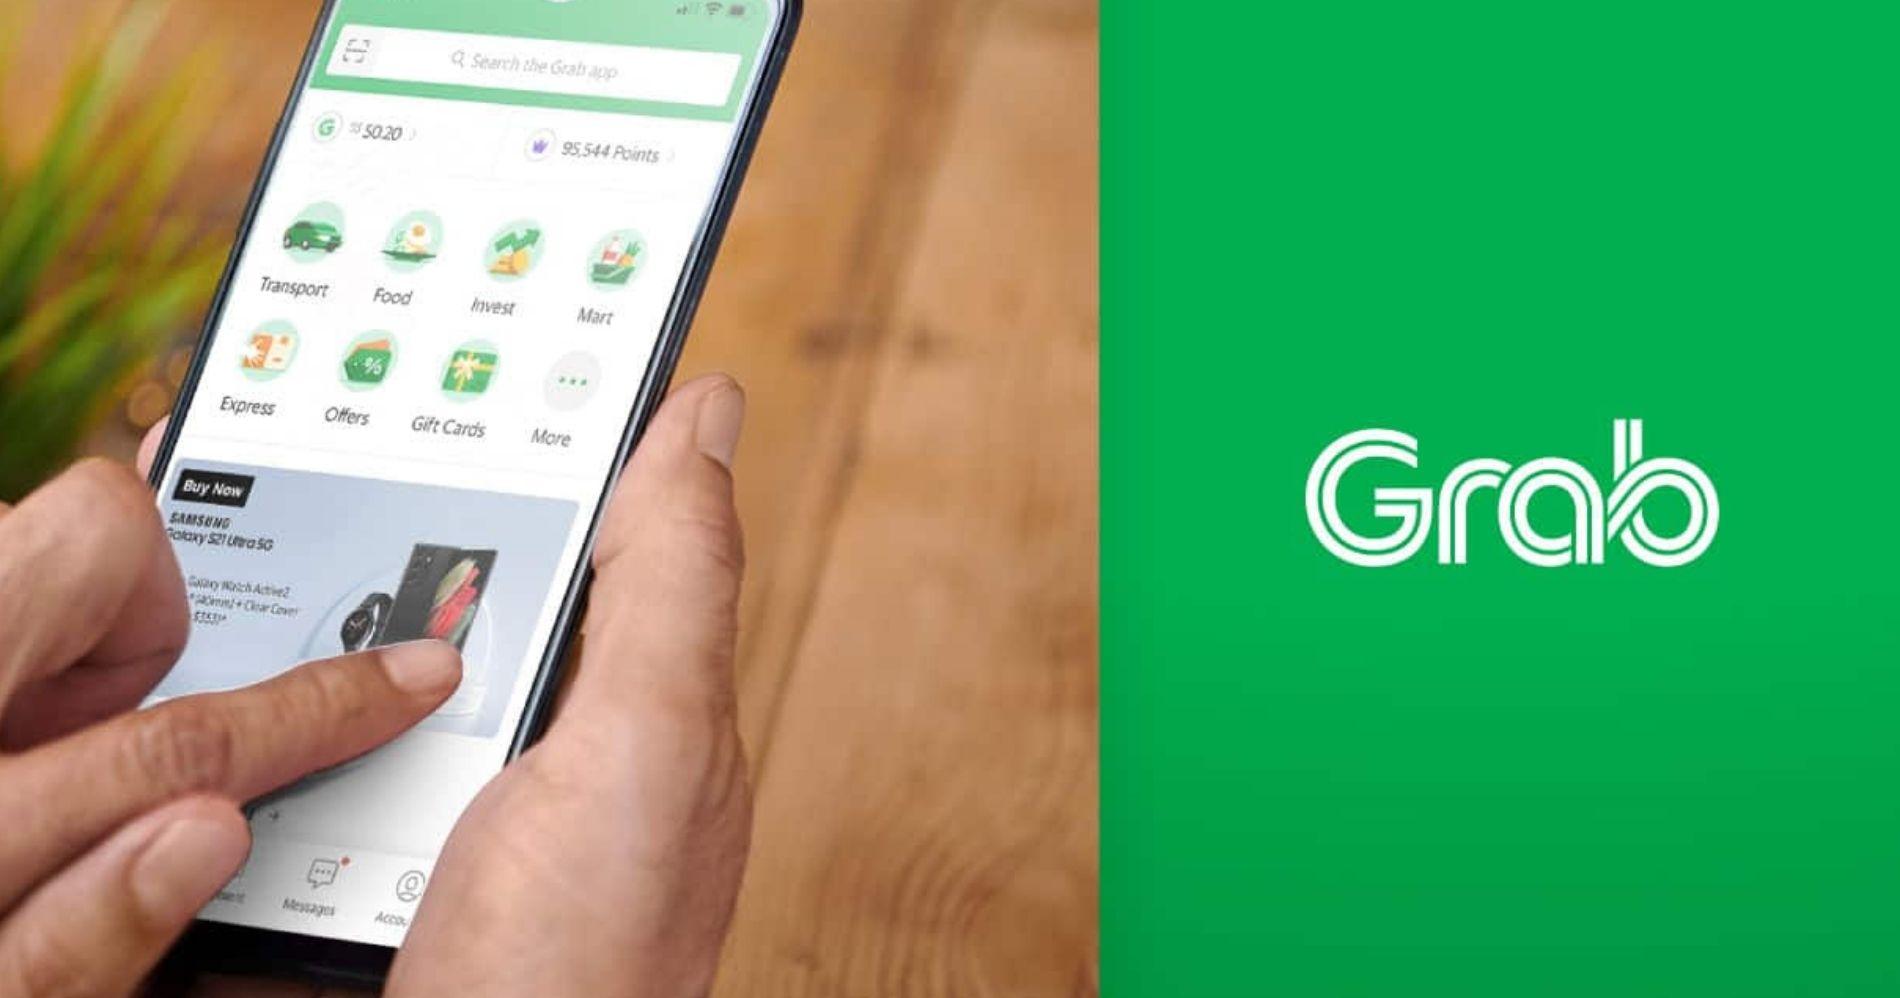 CEO Grab Yakin Skema SPAC Selesai Akhir 2021 Illustration Web Bisnis Muda - Image: Grab